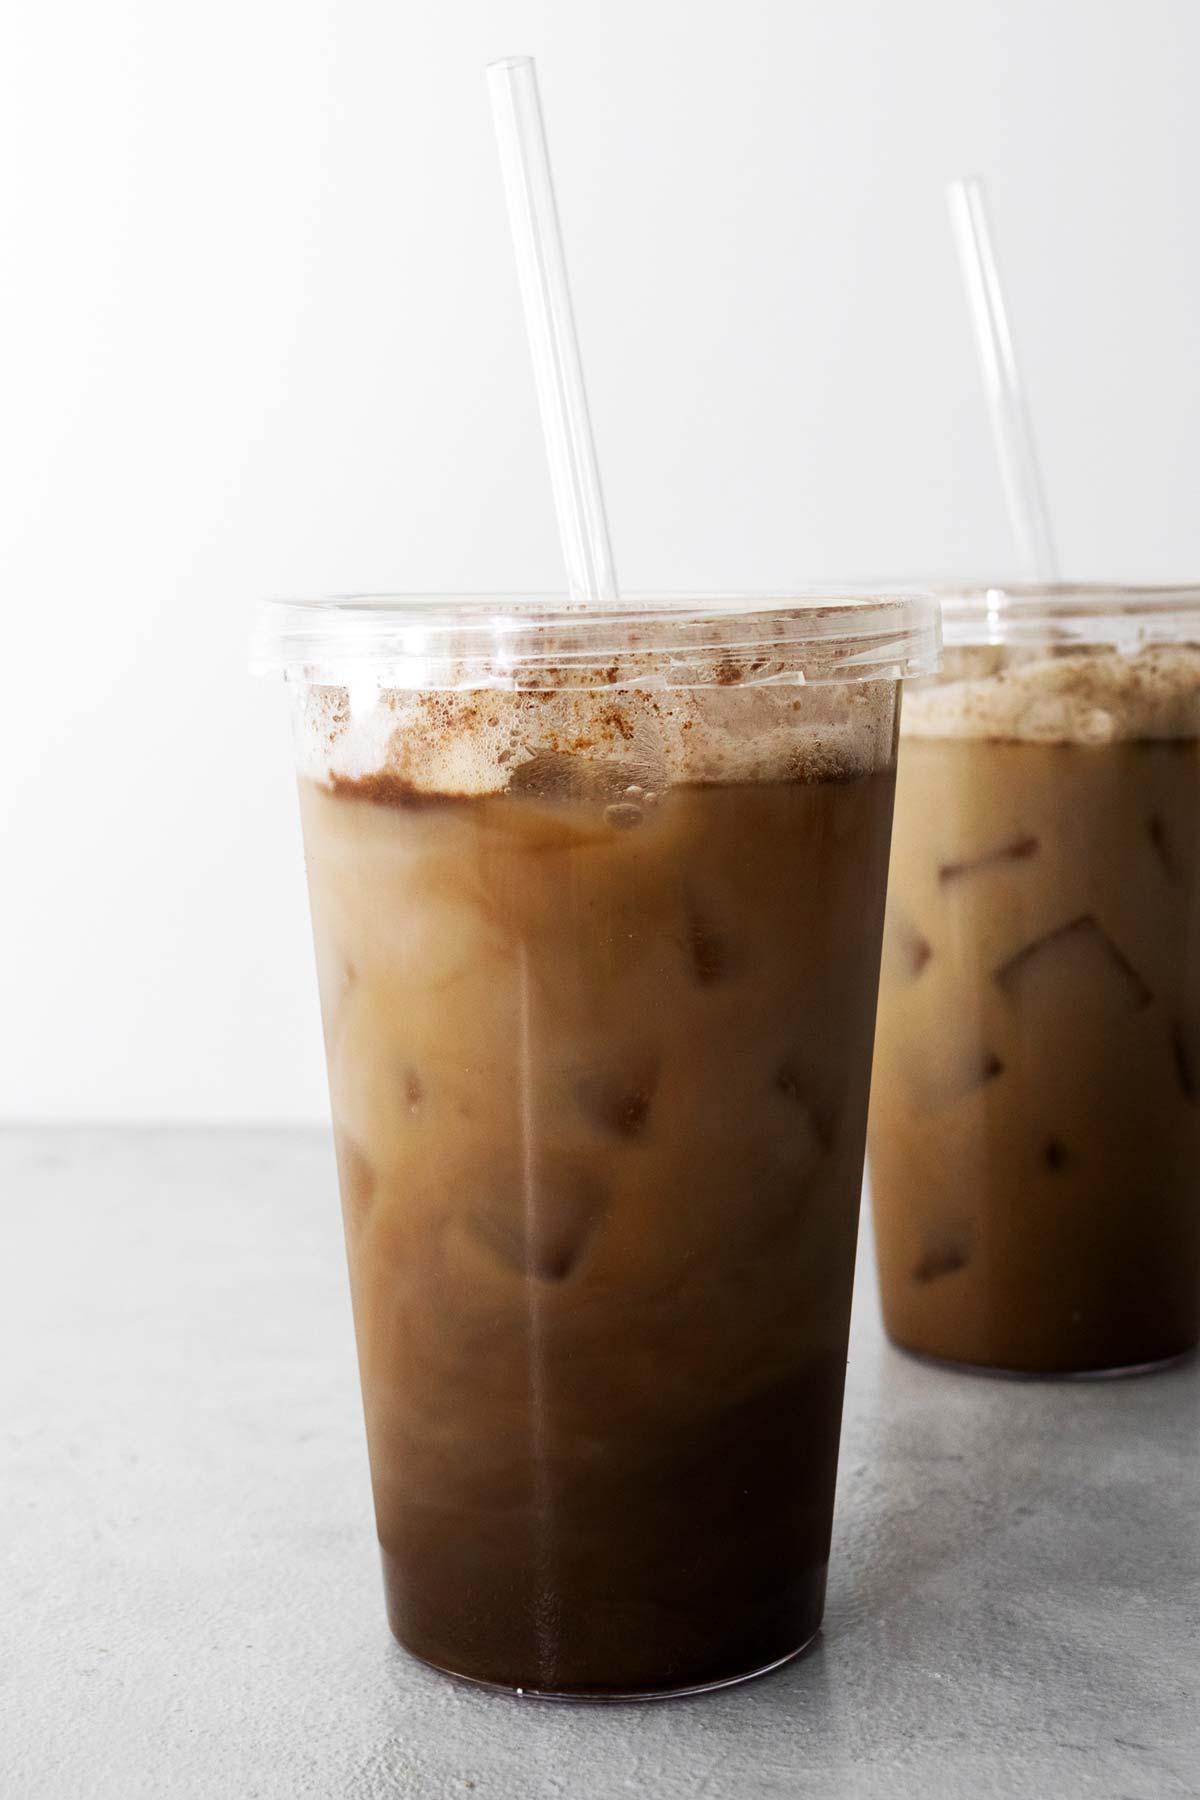 Starbucks Iced Brown Sugar Oatmilk Shaken Espresso copycat drink in cups with straws.